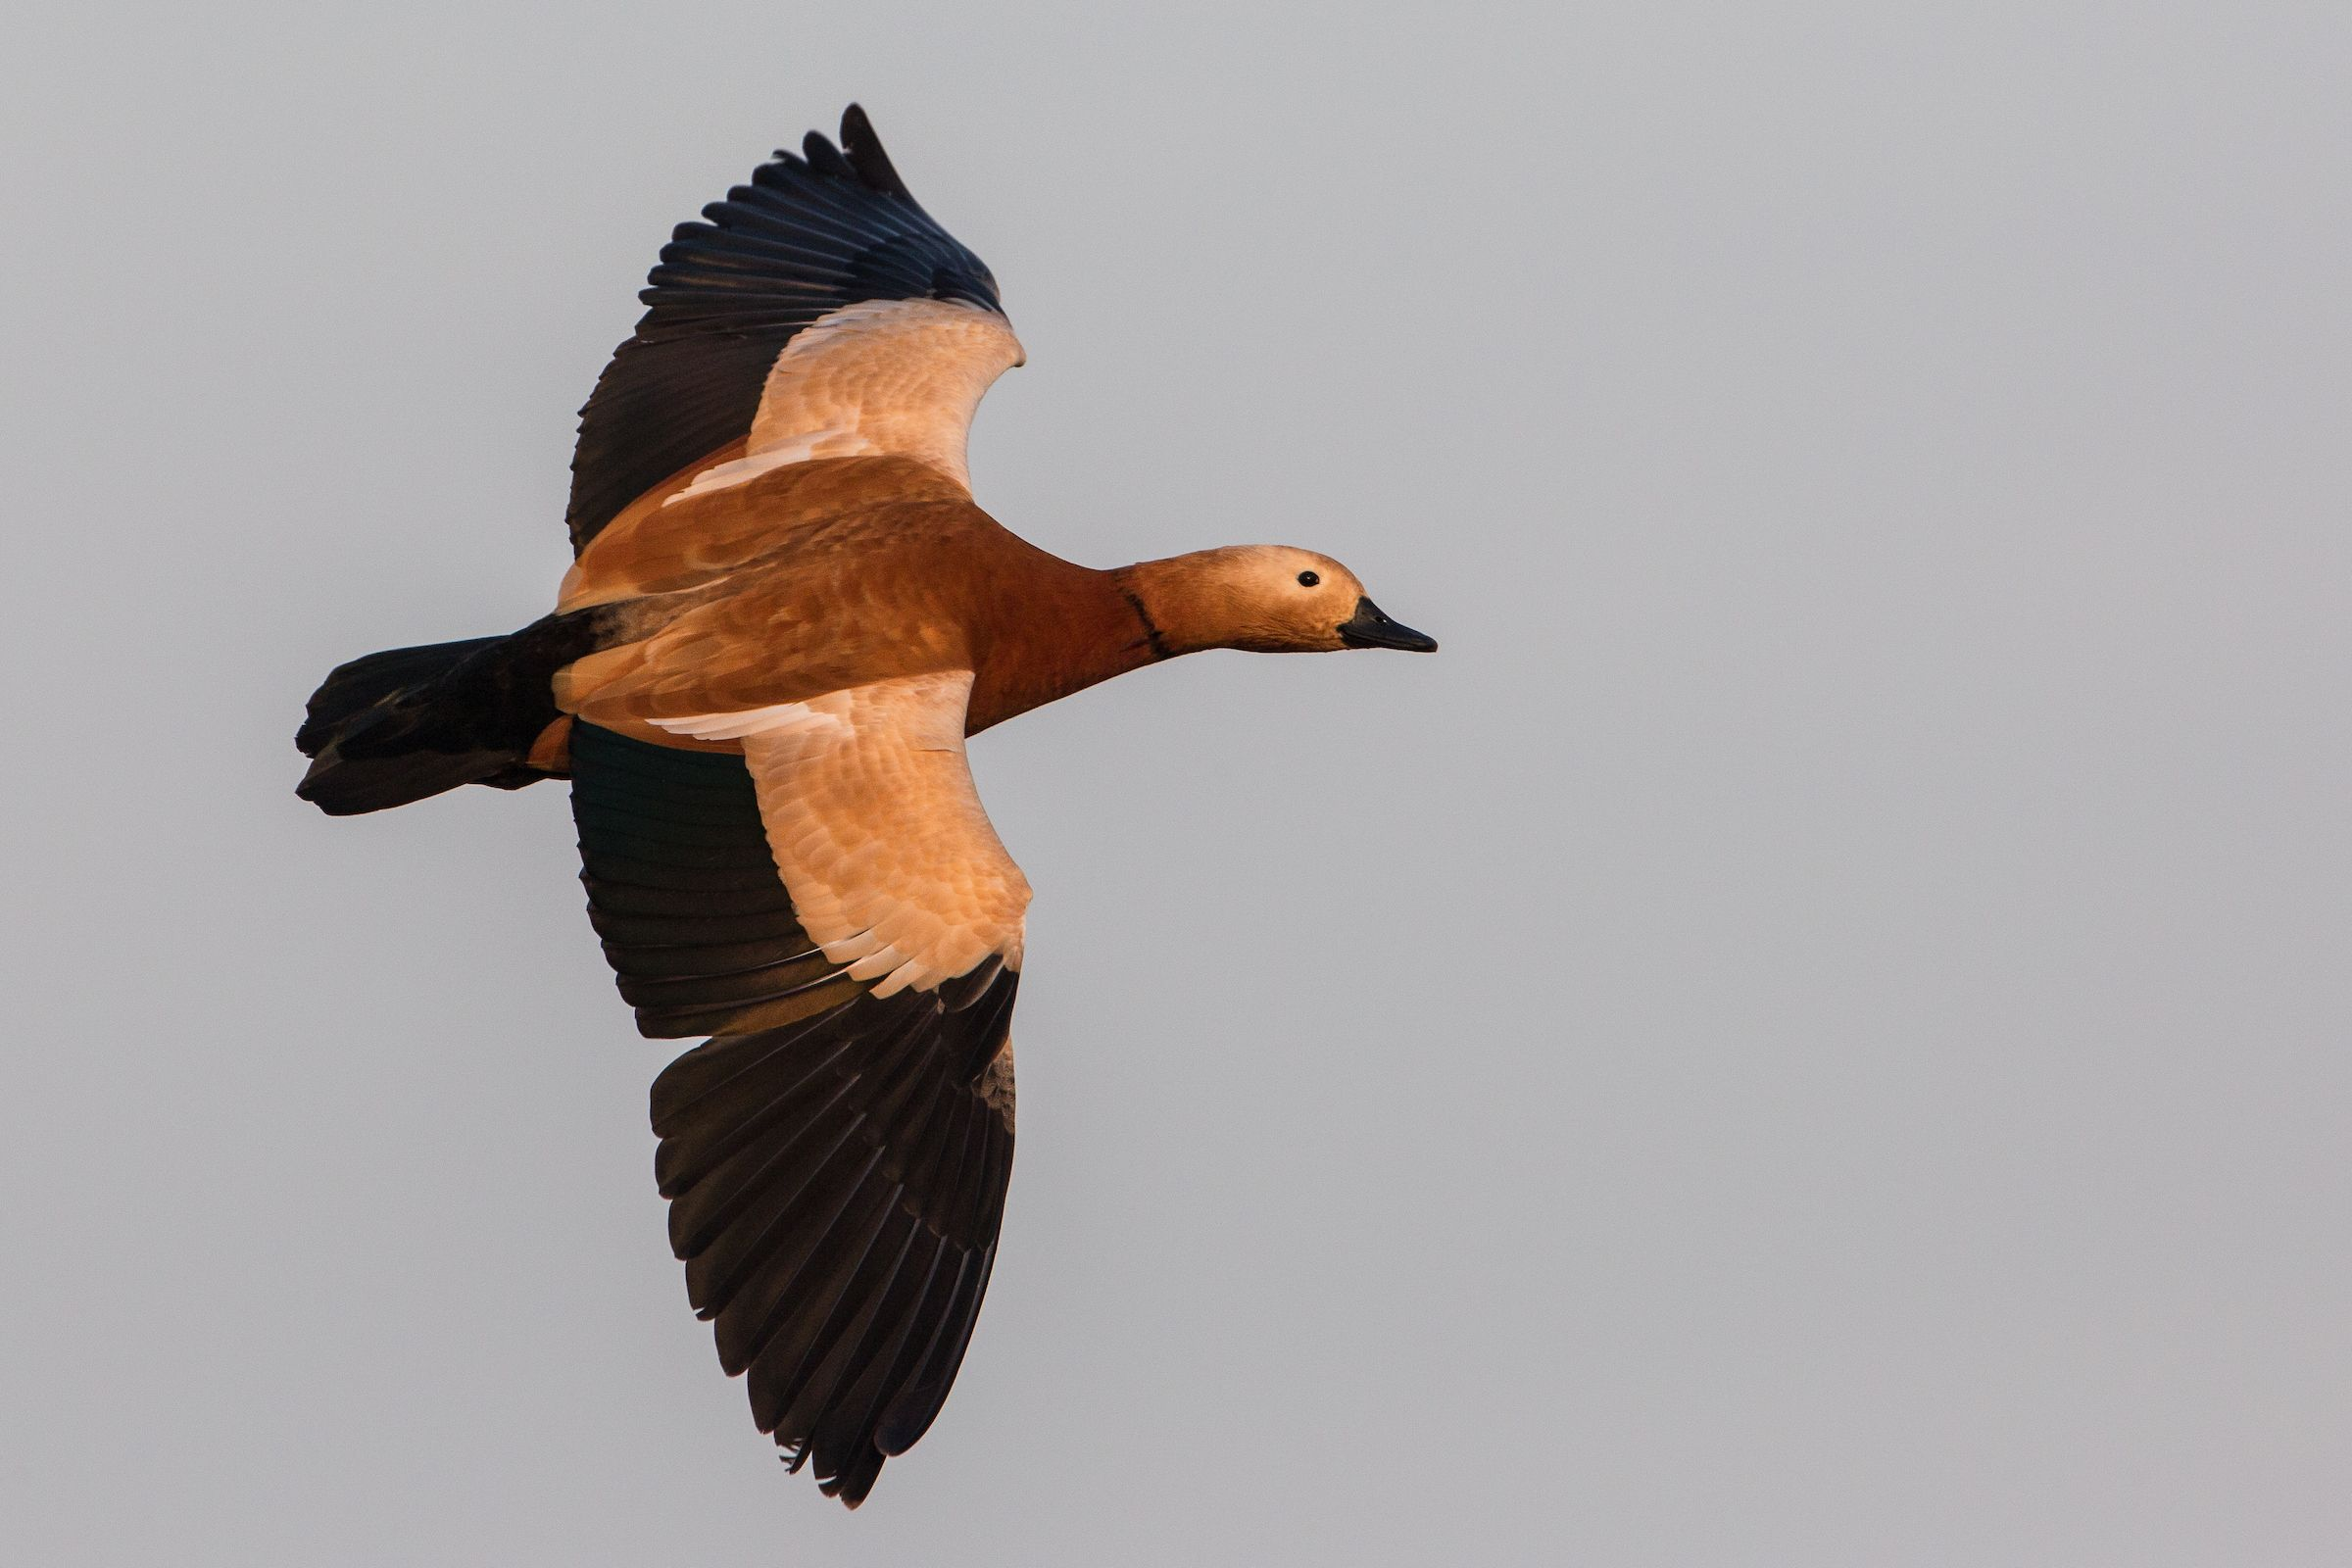 A Ruddy Shelduck in flight over the Chambal River in Uttar Pradesh, India